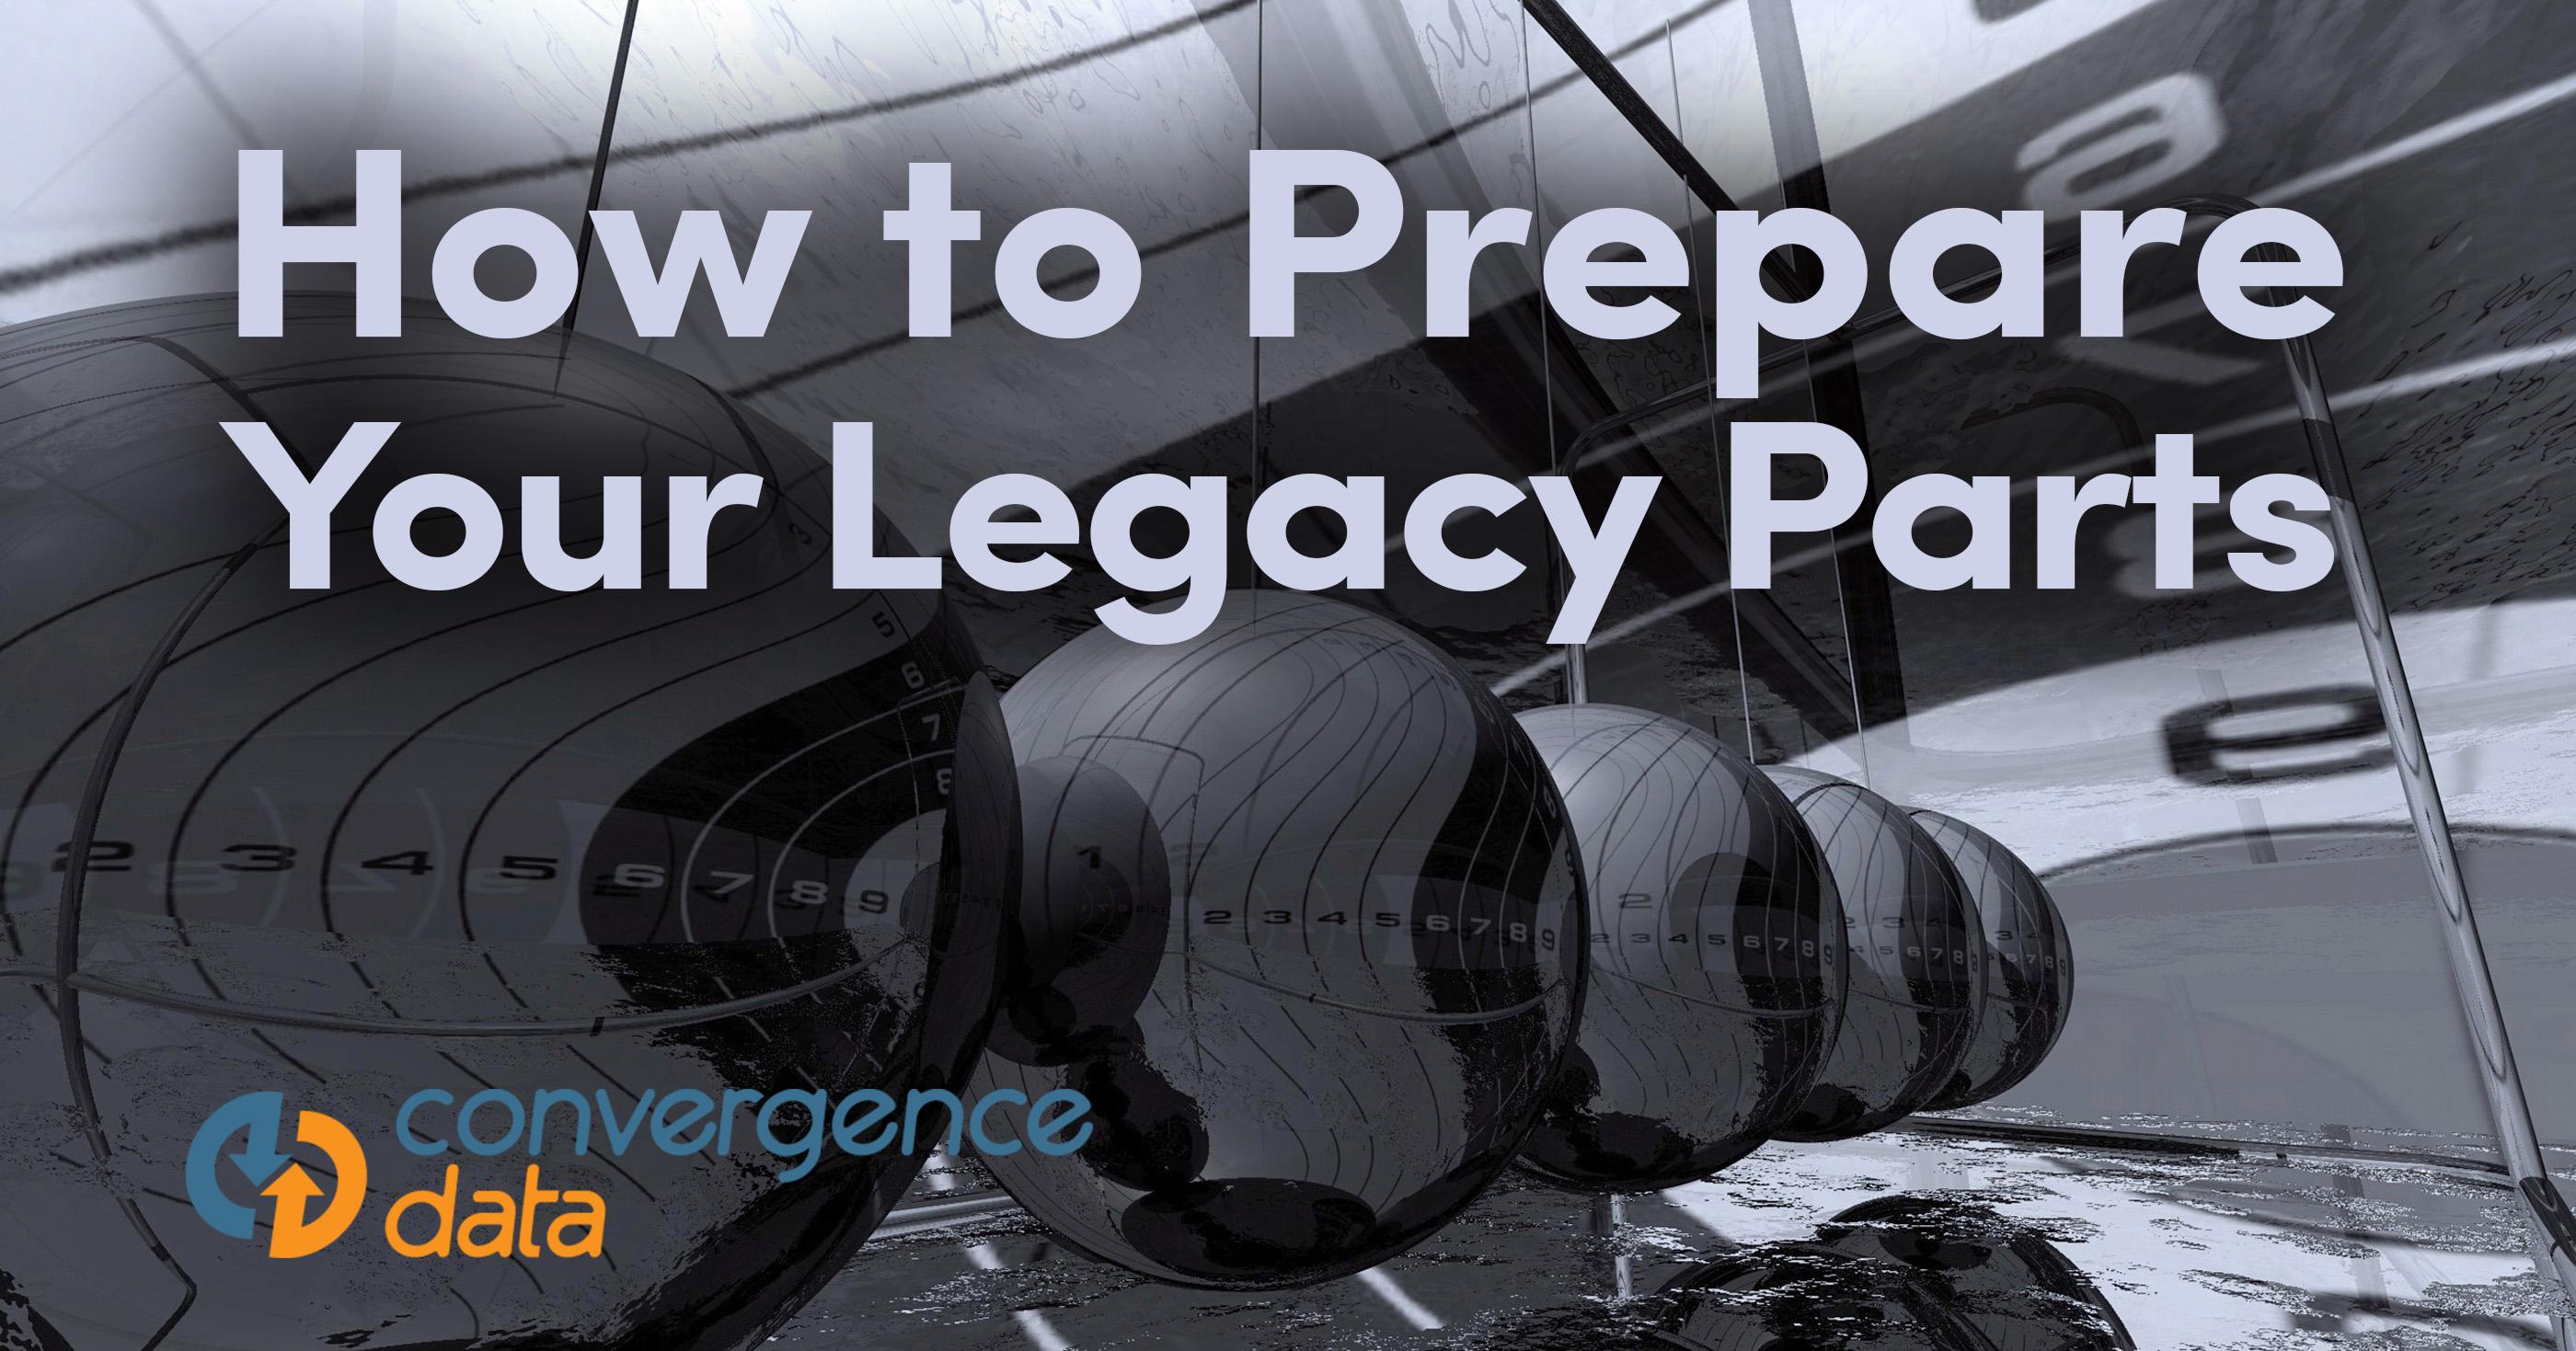 Prepare Legacy Parts